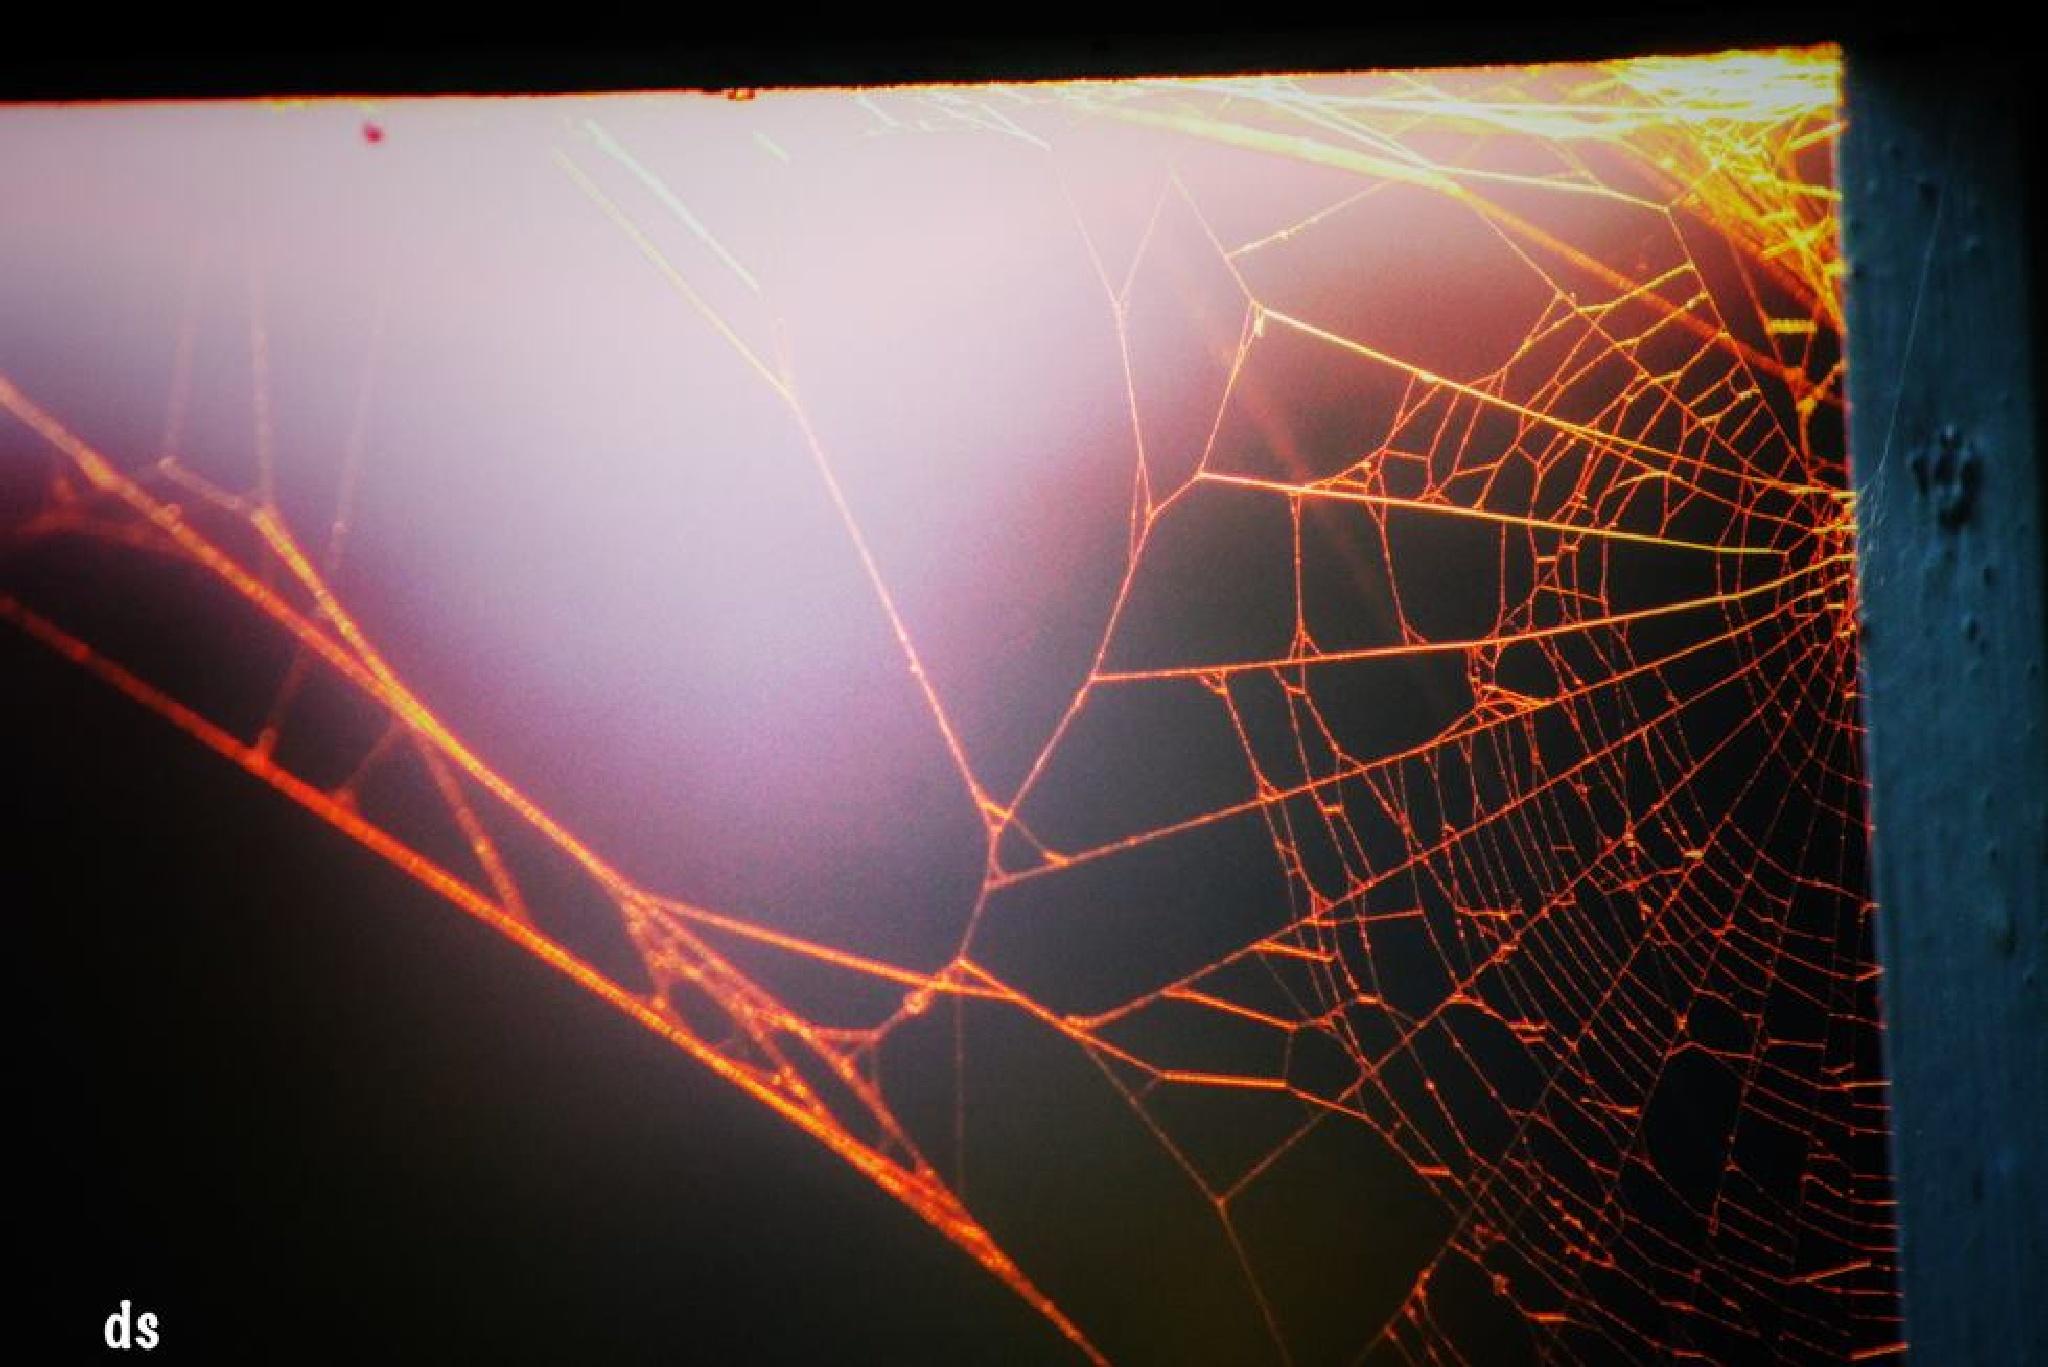 Spider web by Darko Solina